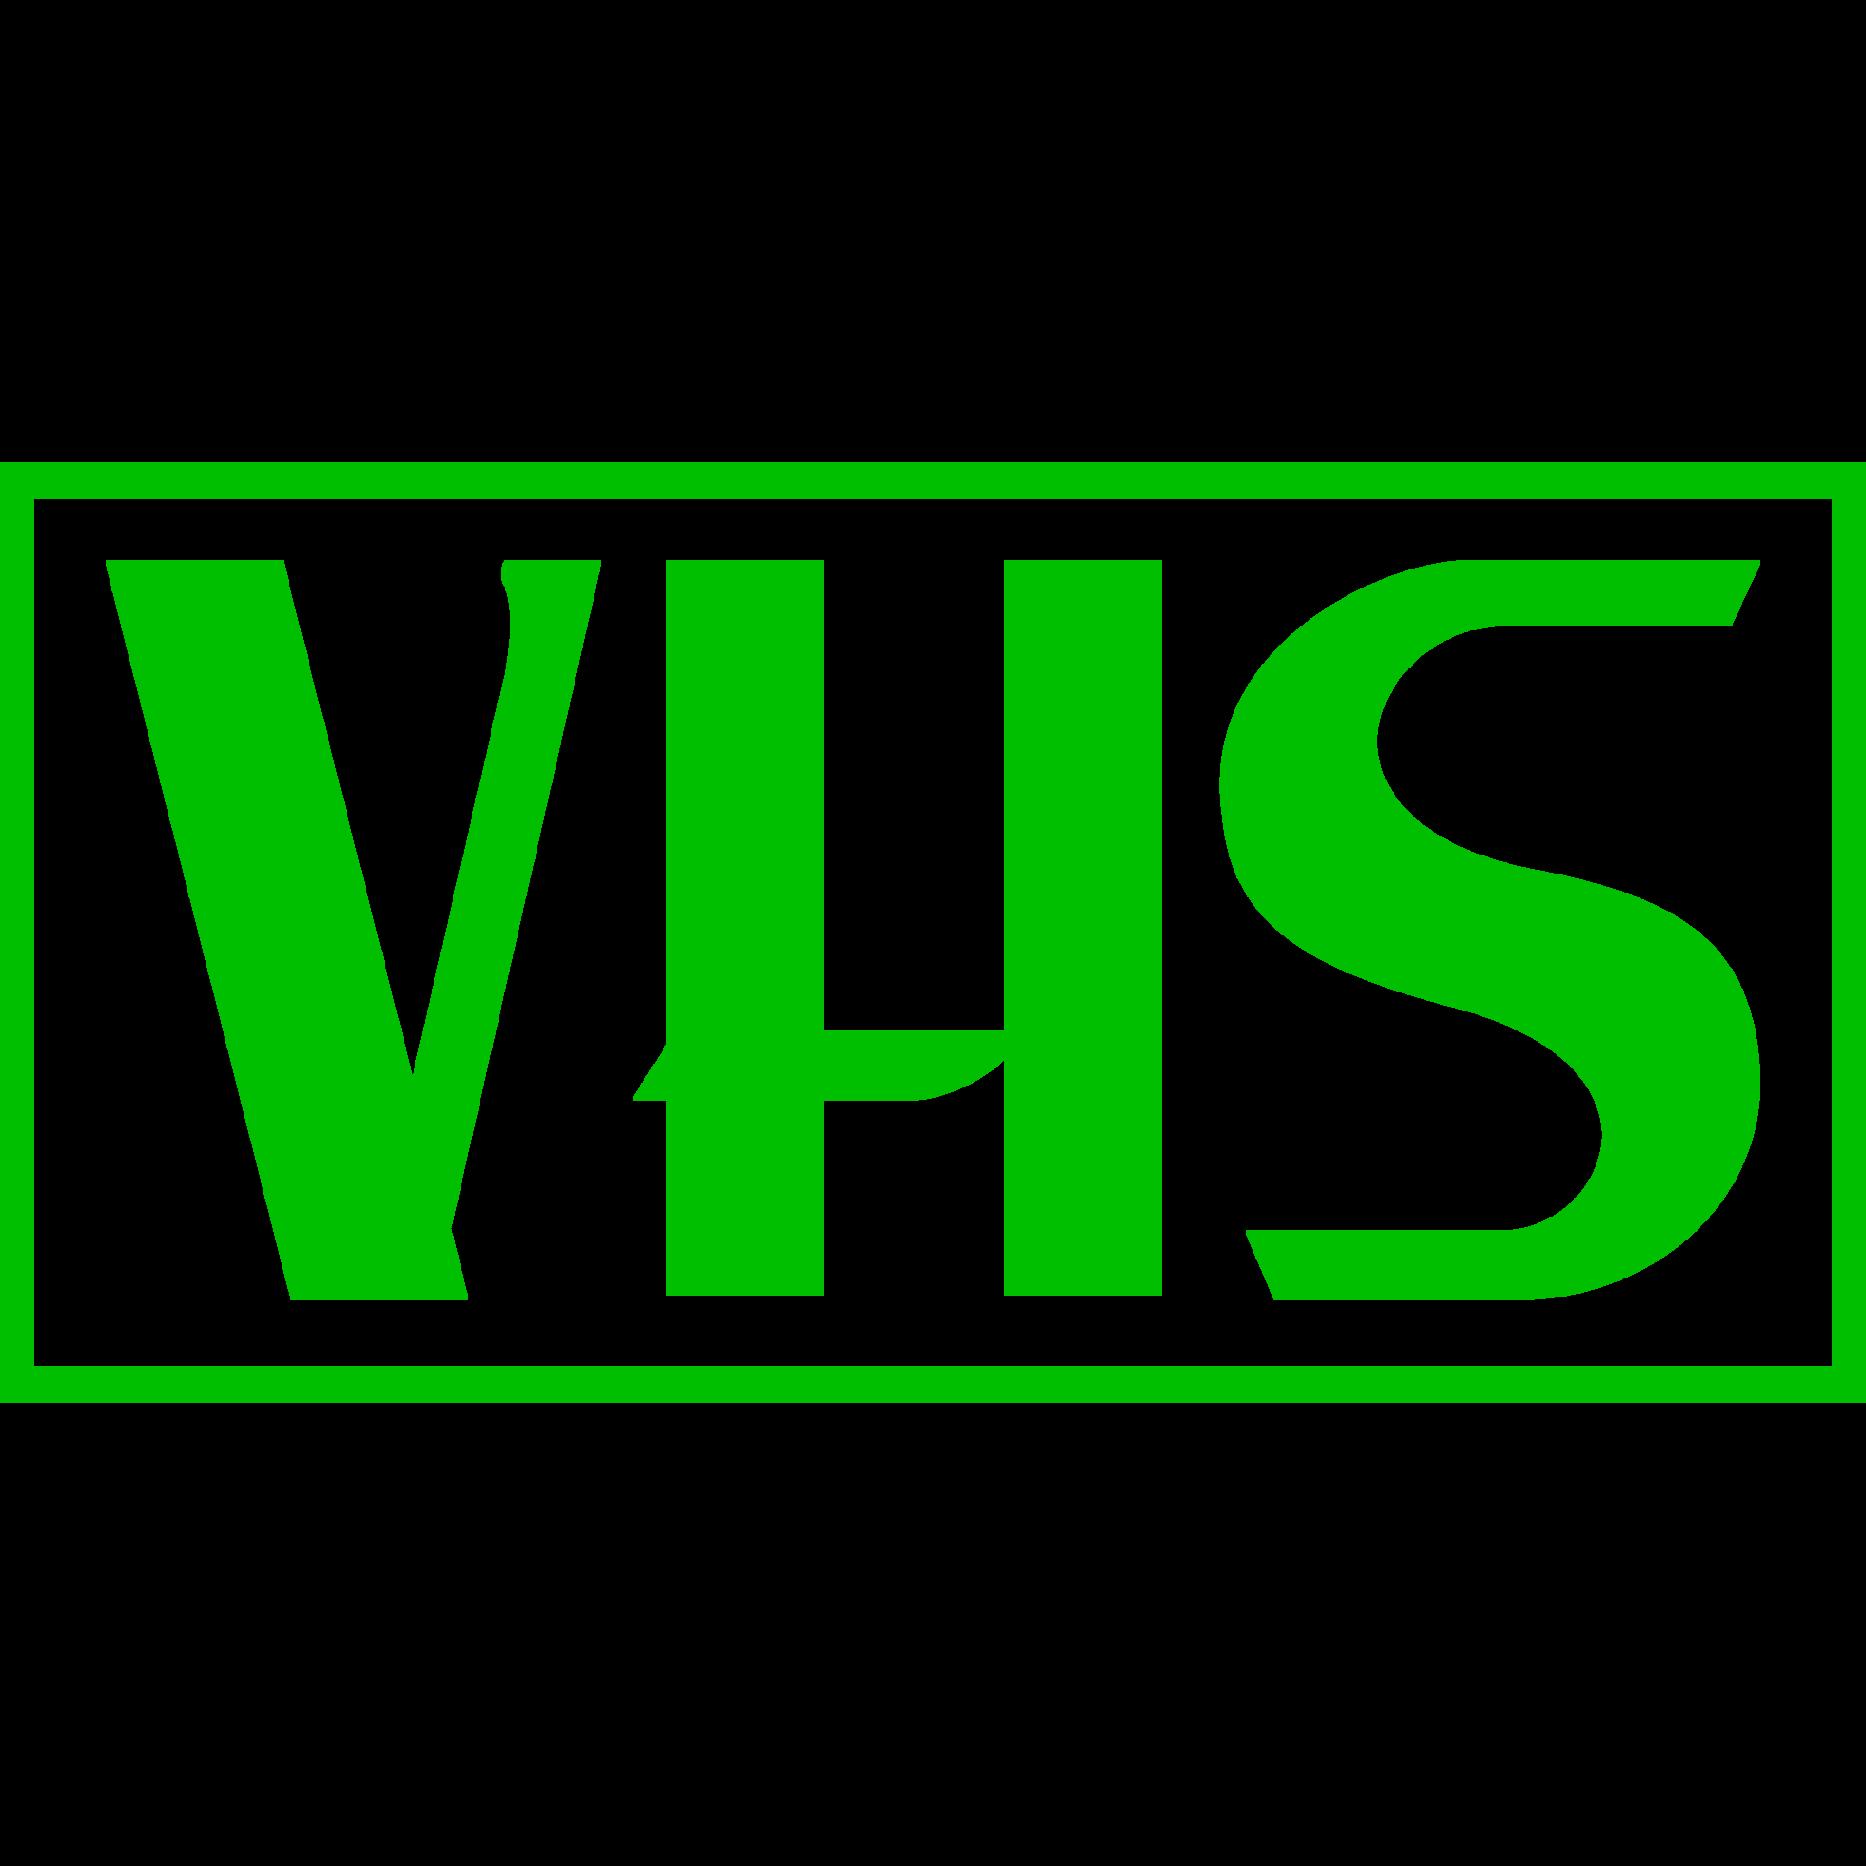 free dvd logo clip art - photo #11